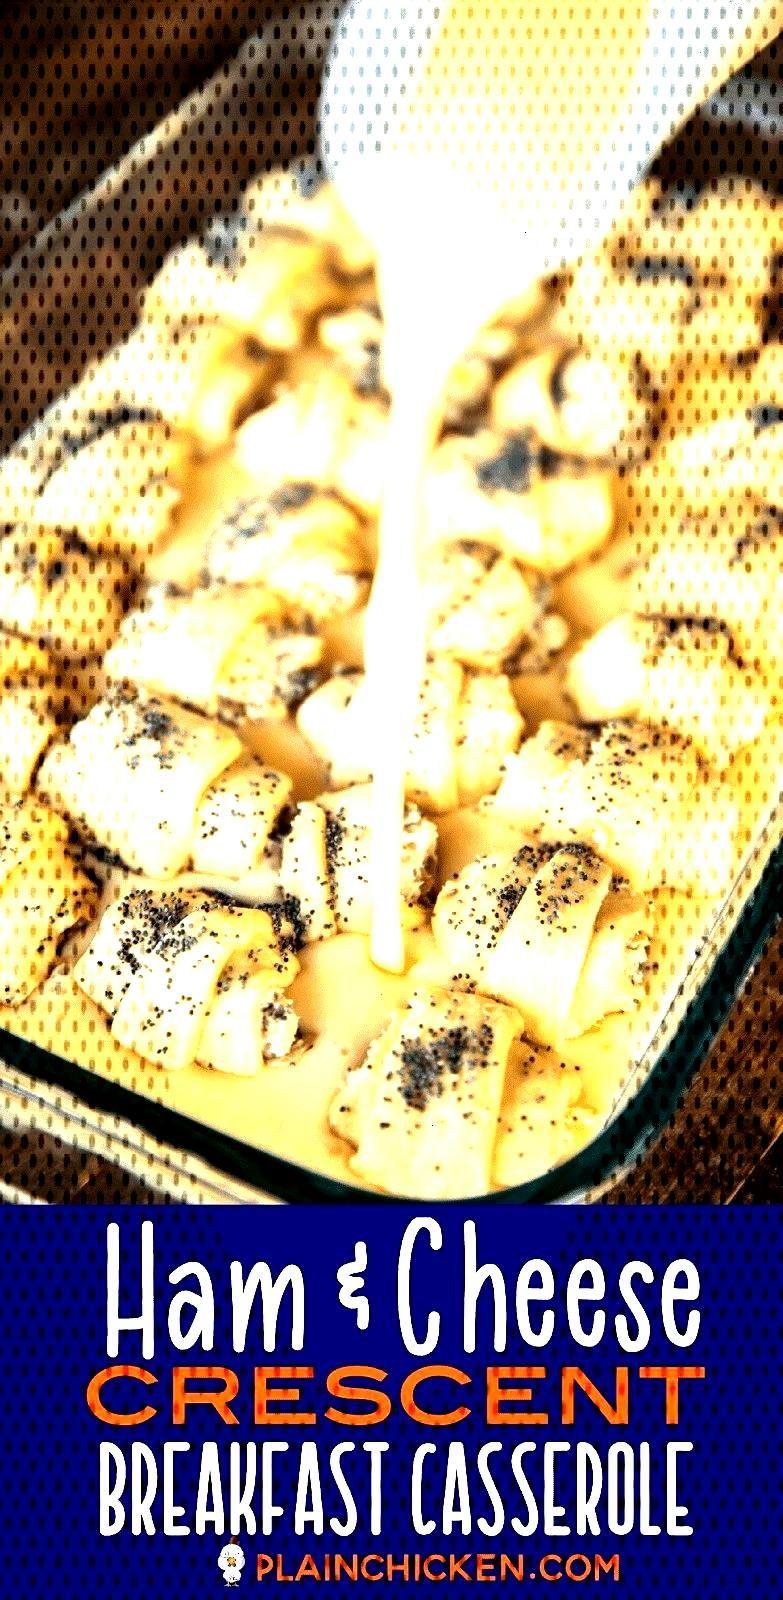 Ham amp Cheese Crescent Breakfast Casserole - seriously the BEST!!! Crescent rolls, ham, cheese, brow